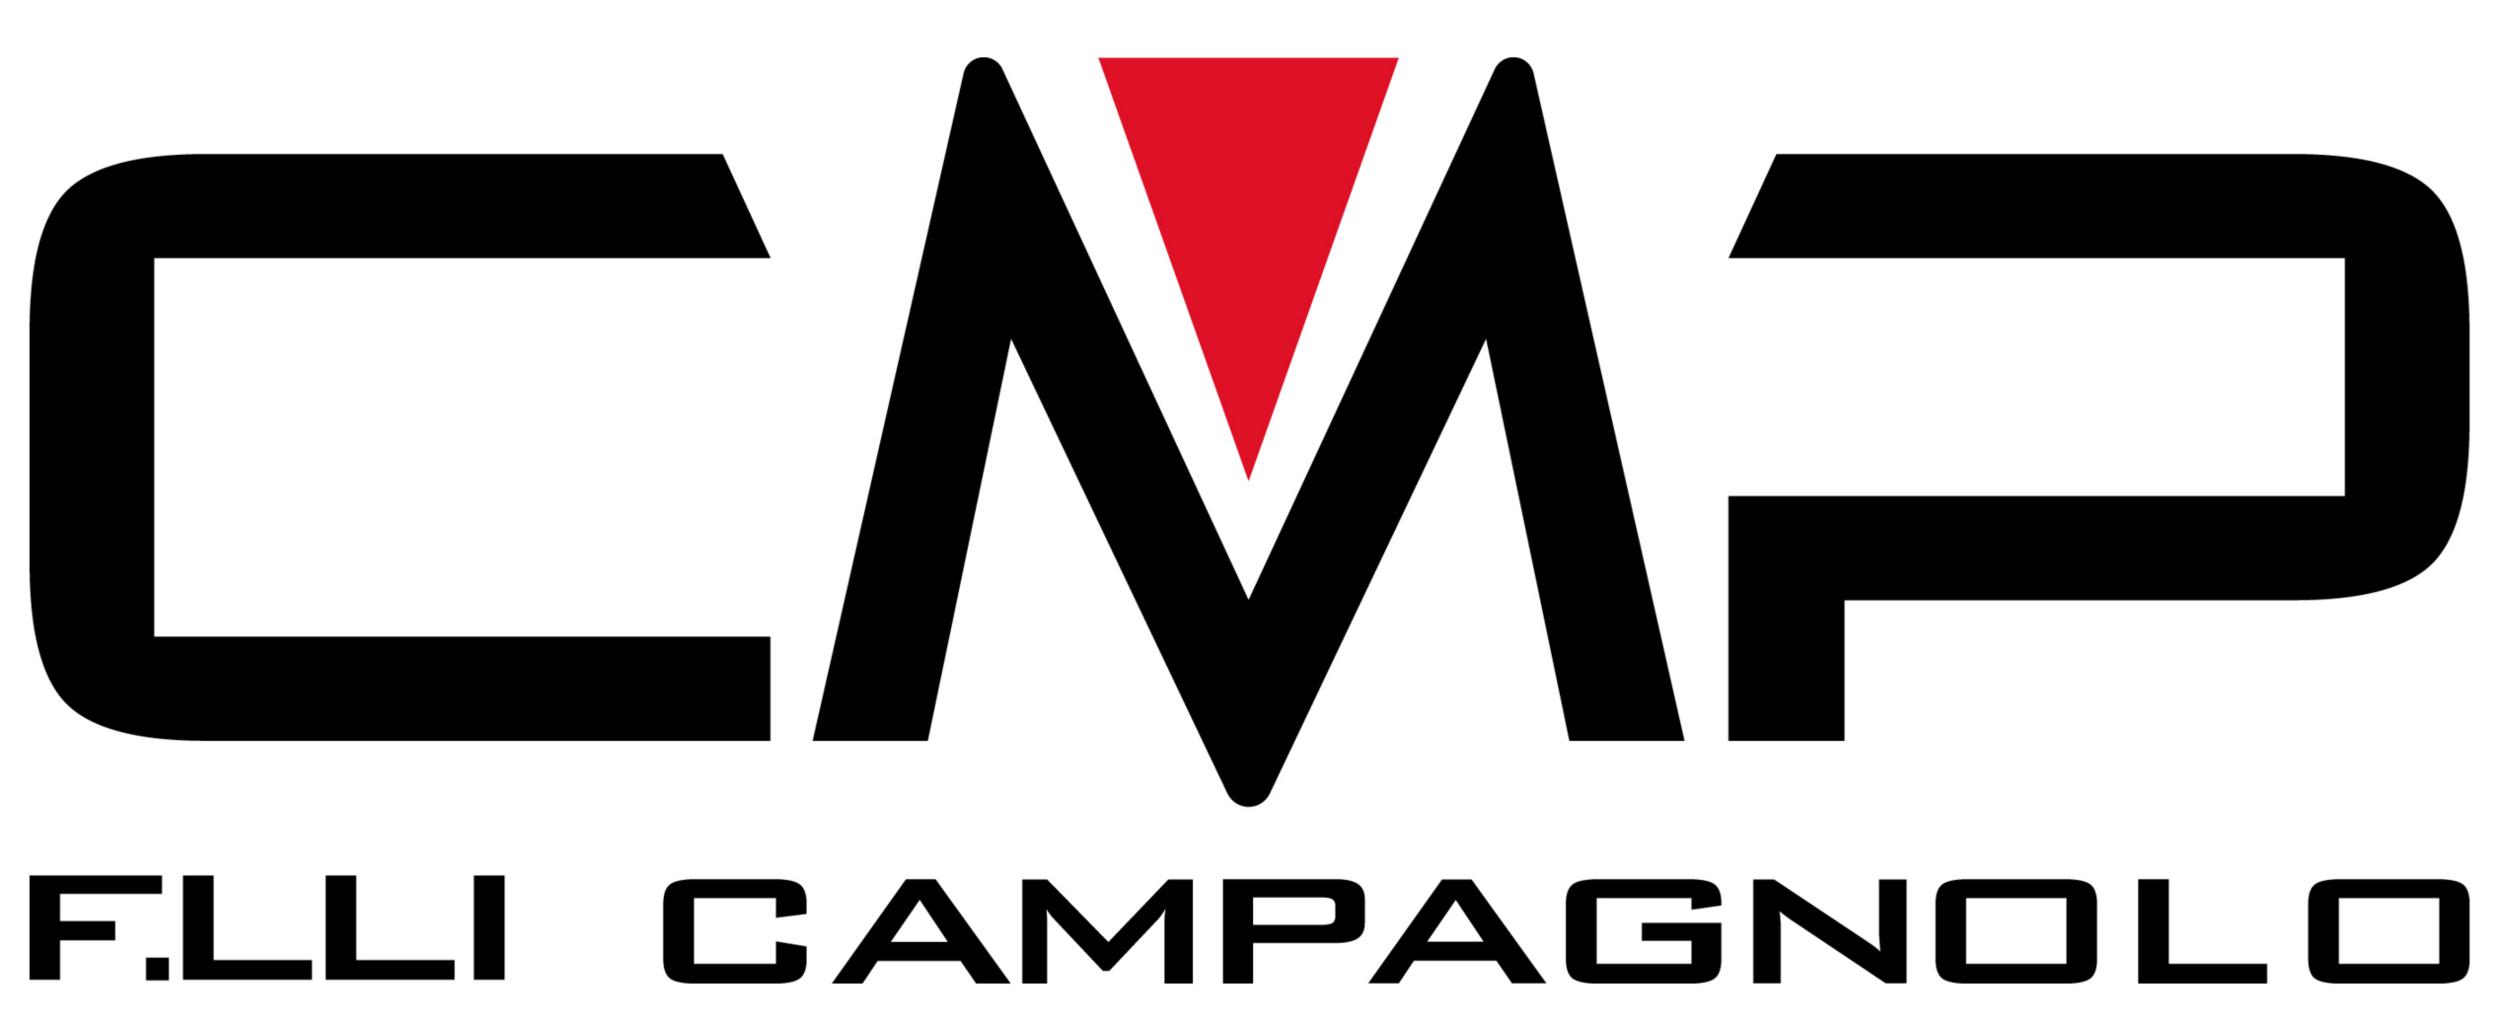 CMP-logo.jpg